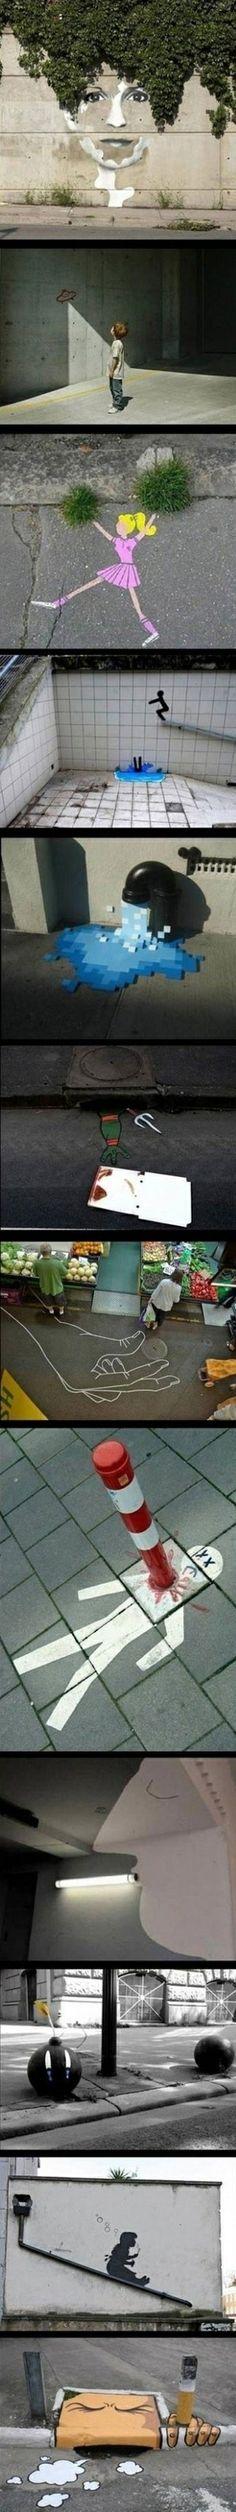 street art makes our lives richer.... :)